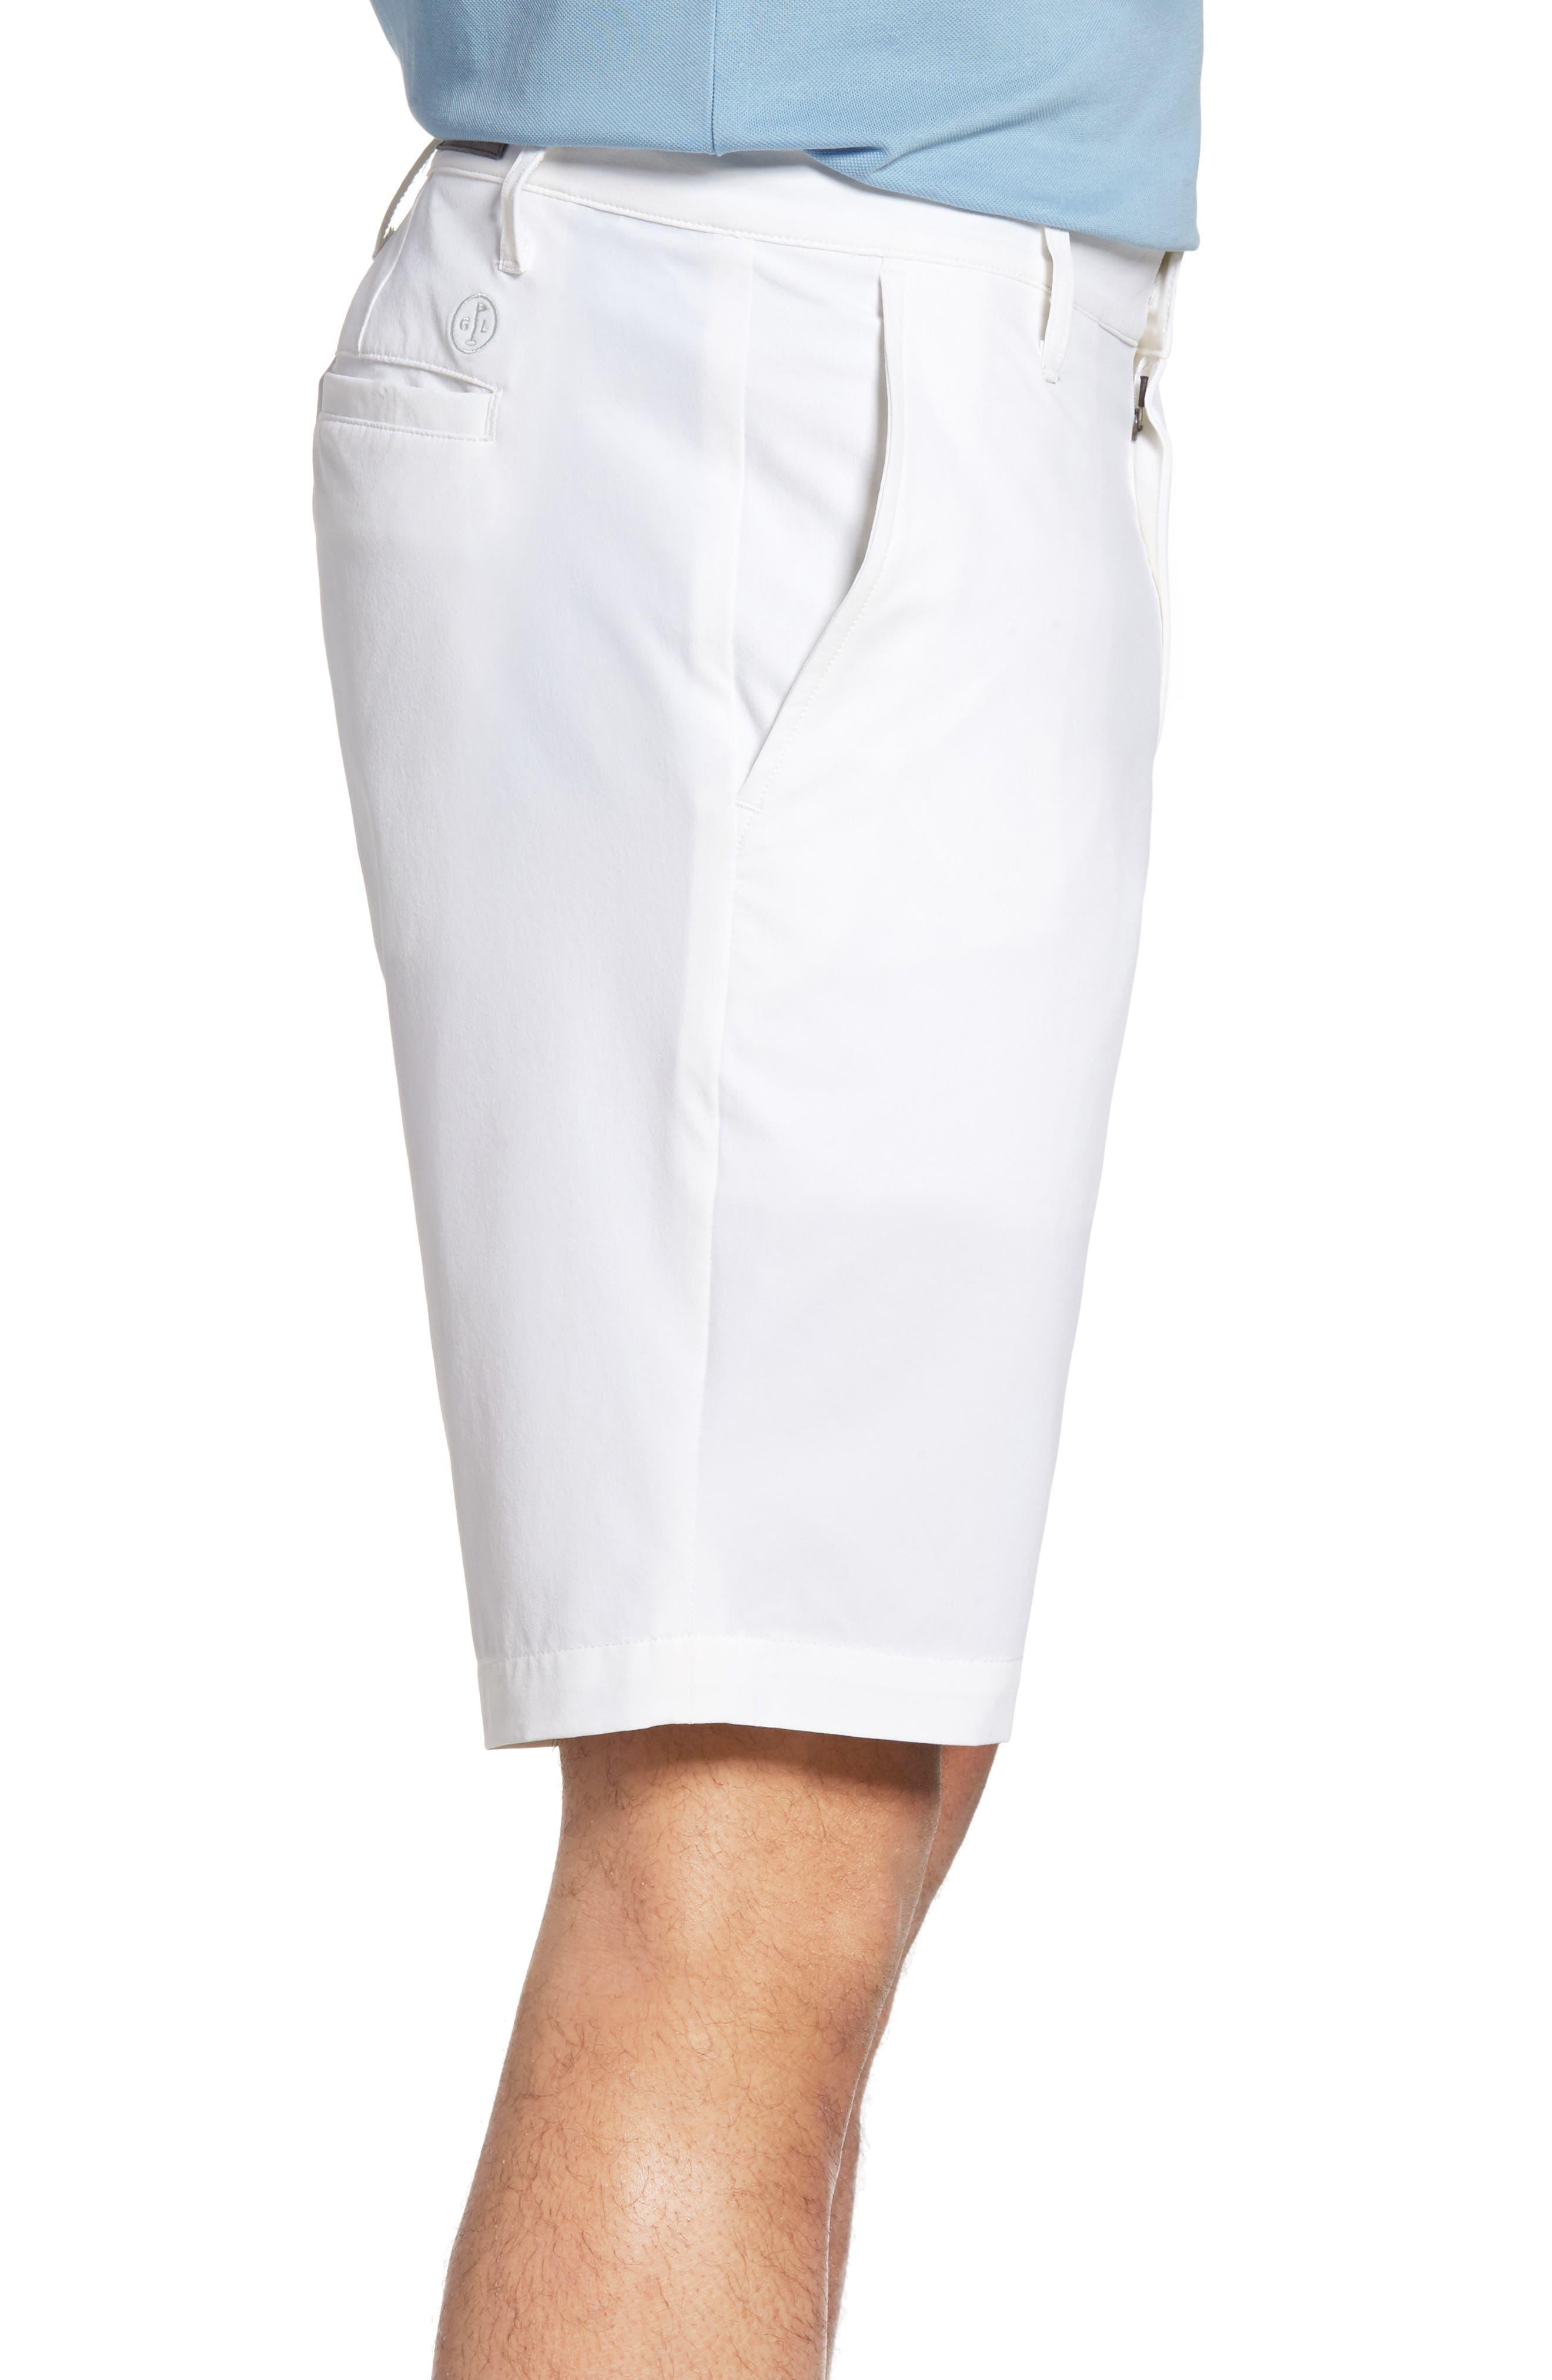 Canyon Shorts,                             Alternate thumbnail 3, color,                             Bright White